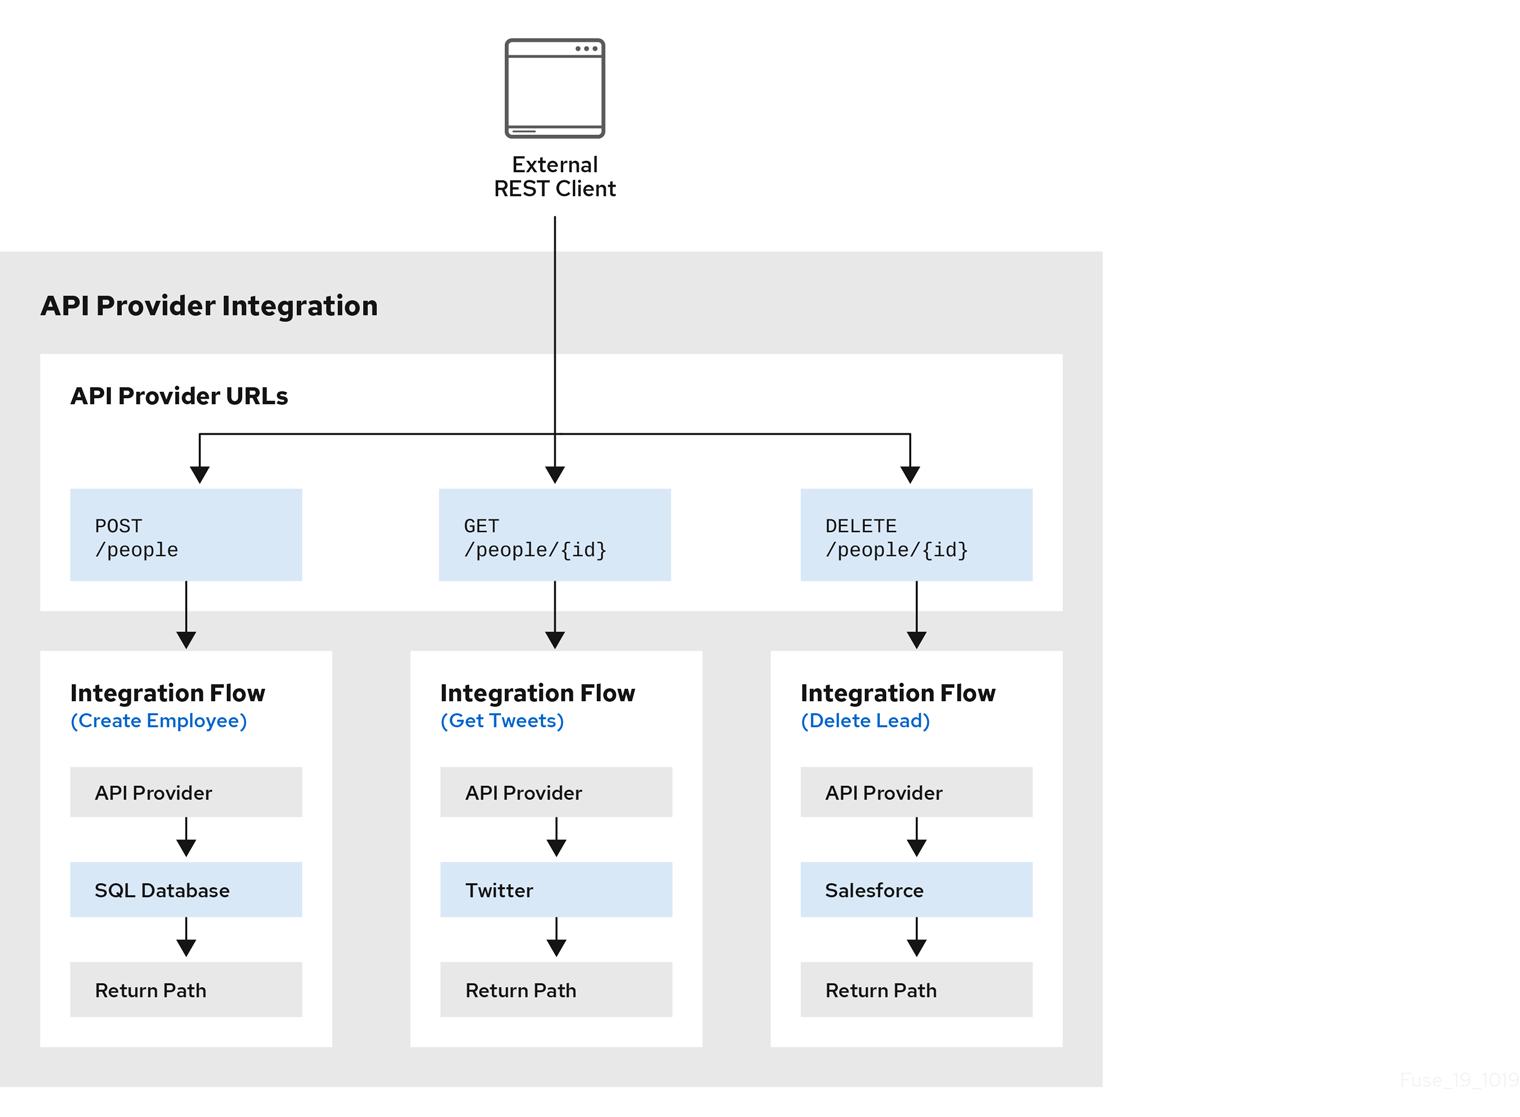 API provider integration with 3 flows